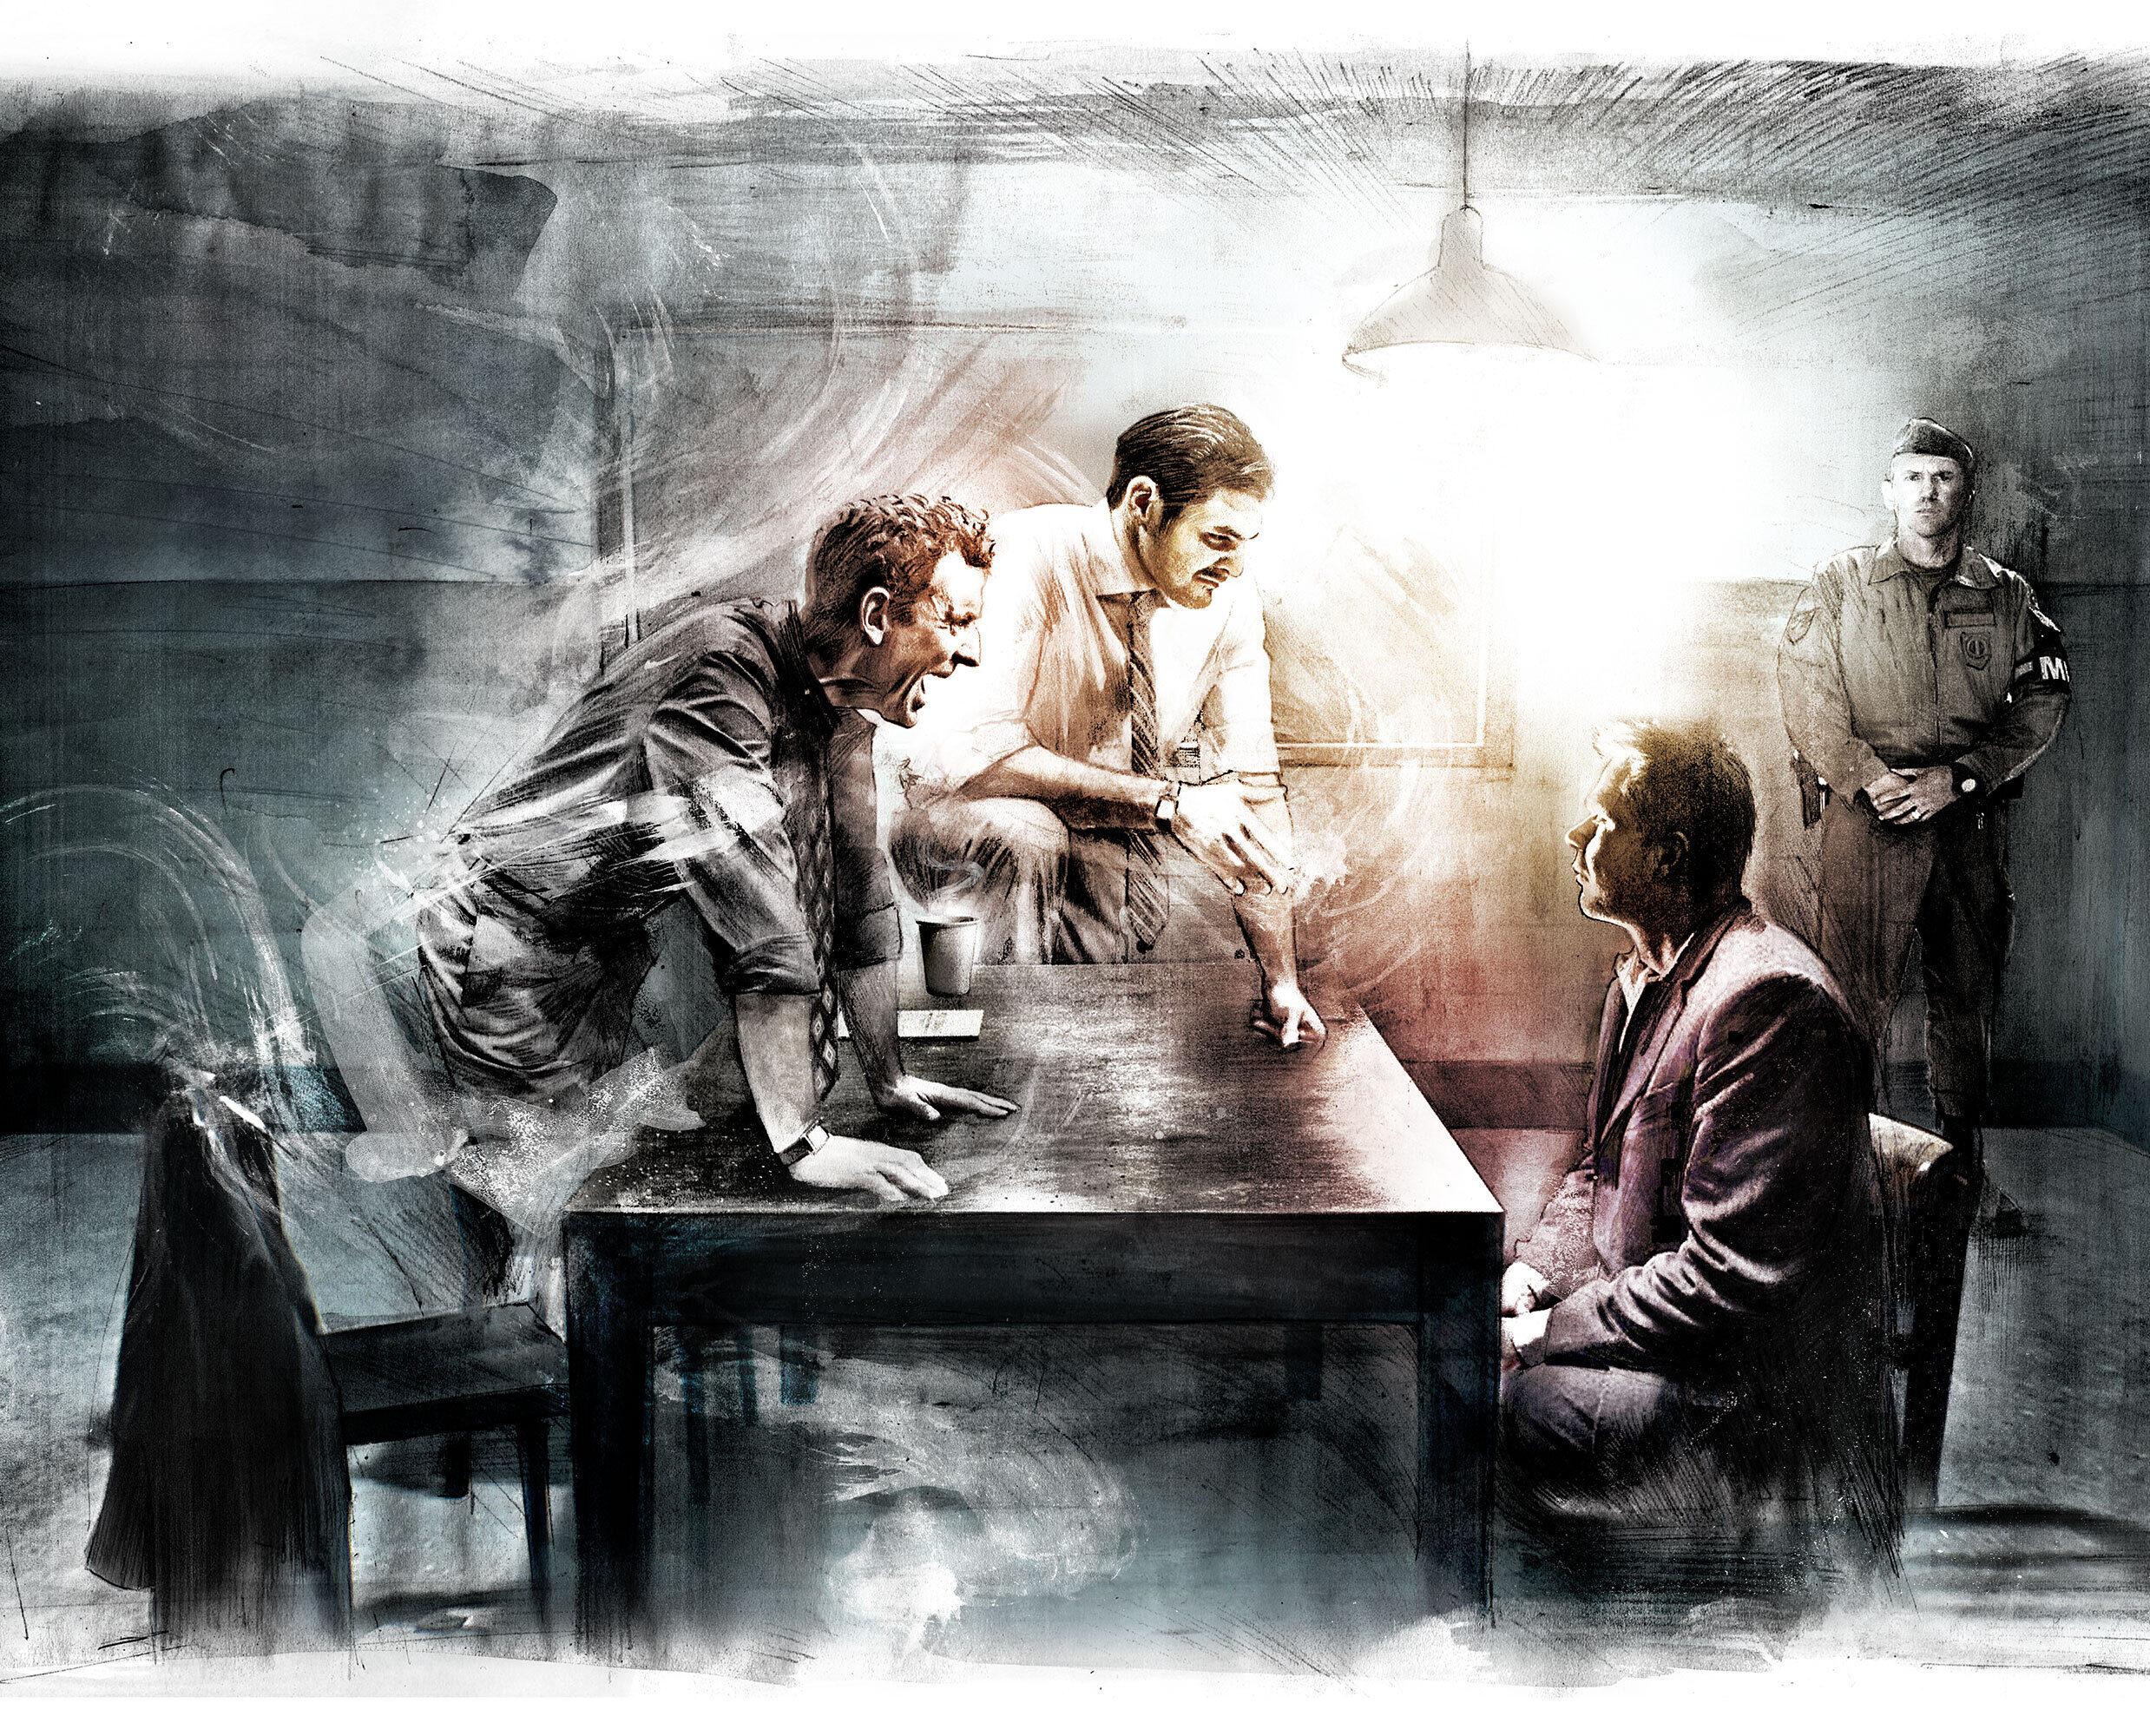 Interrogation Illustration - Kornel Illustration   Kornel Stadler portfolio